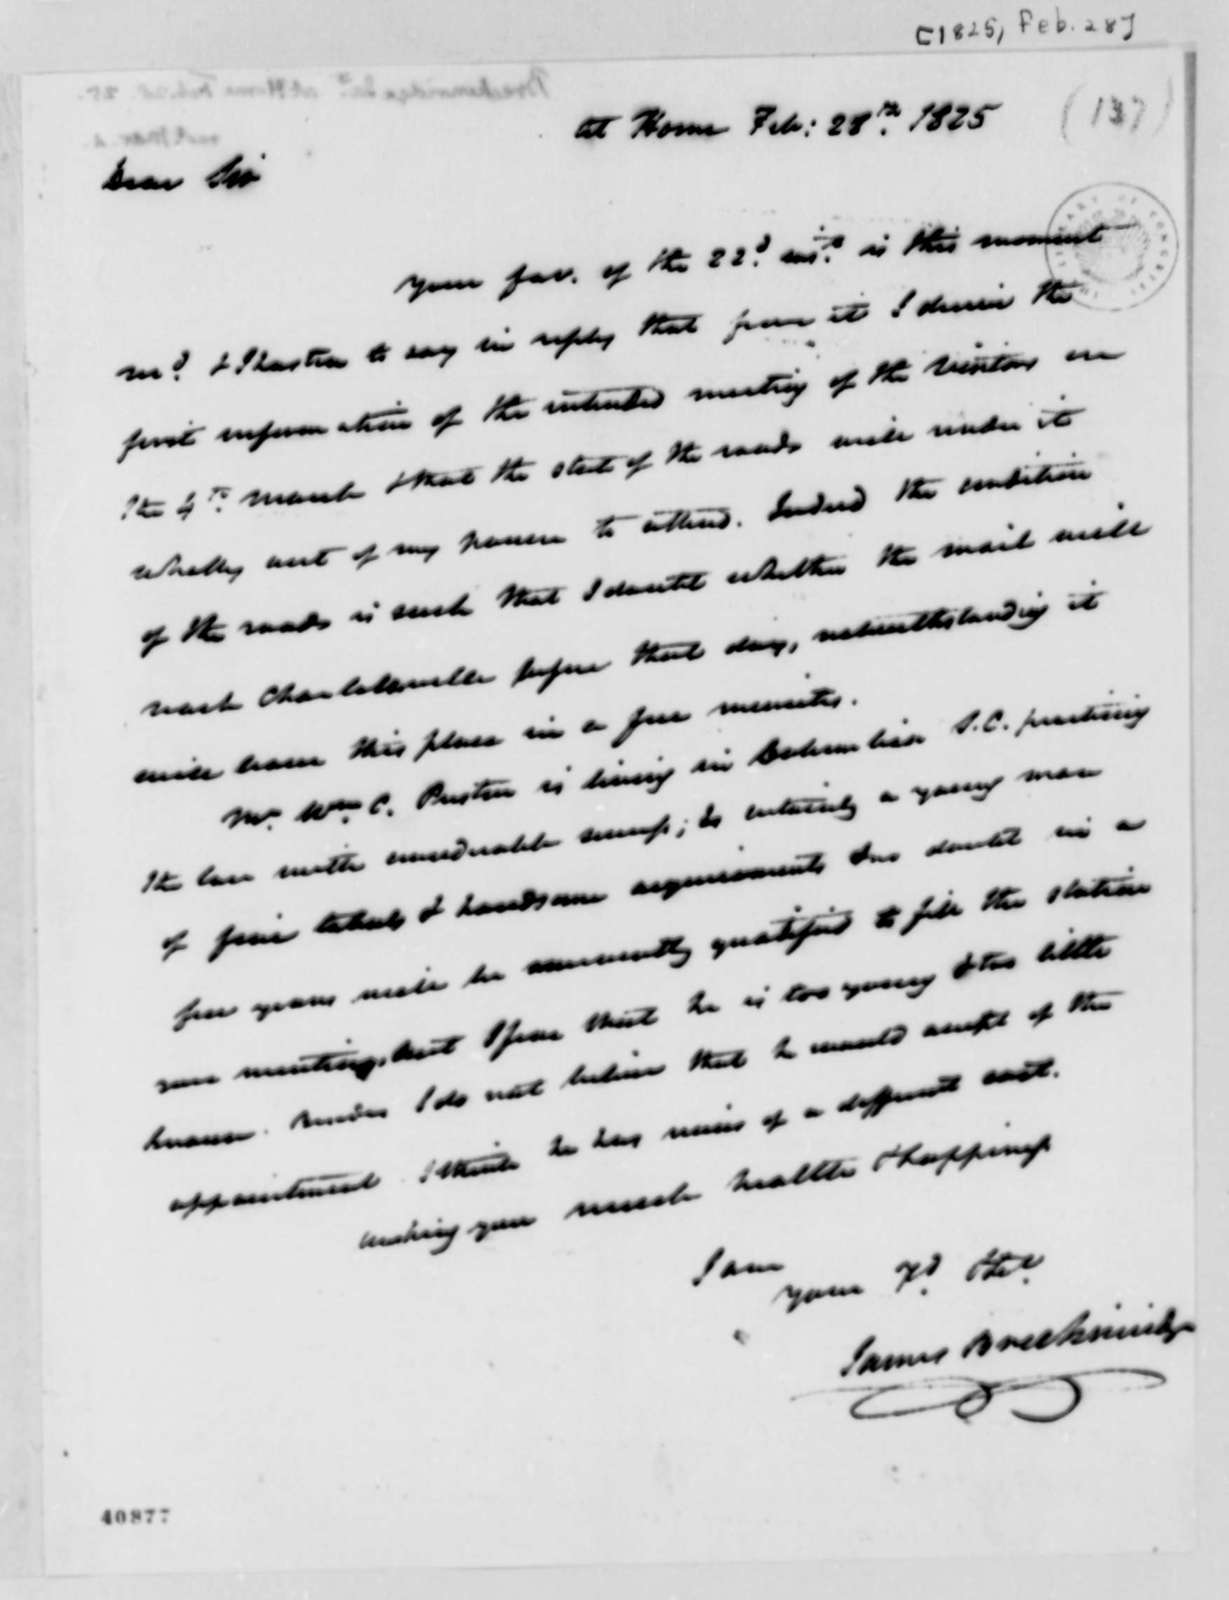 James Breckinridge to Thomas Jefferson, February 28, 1825